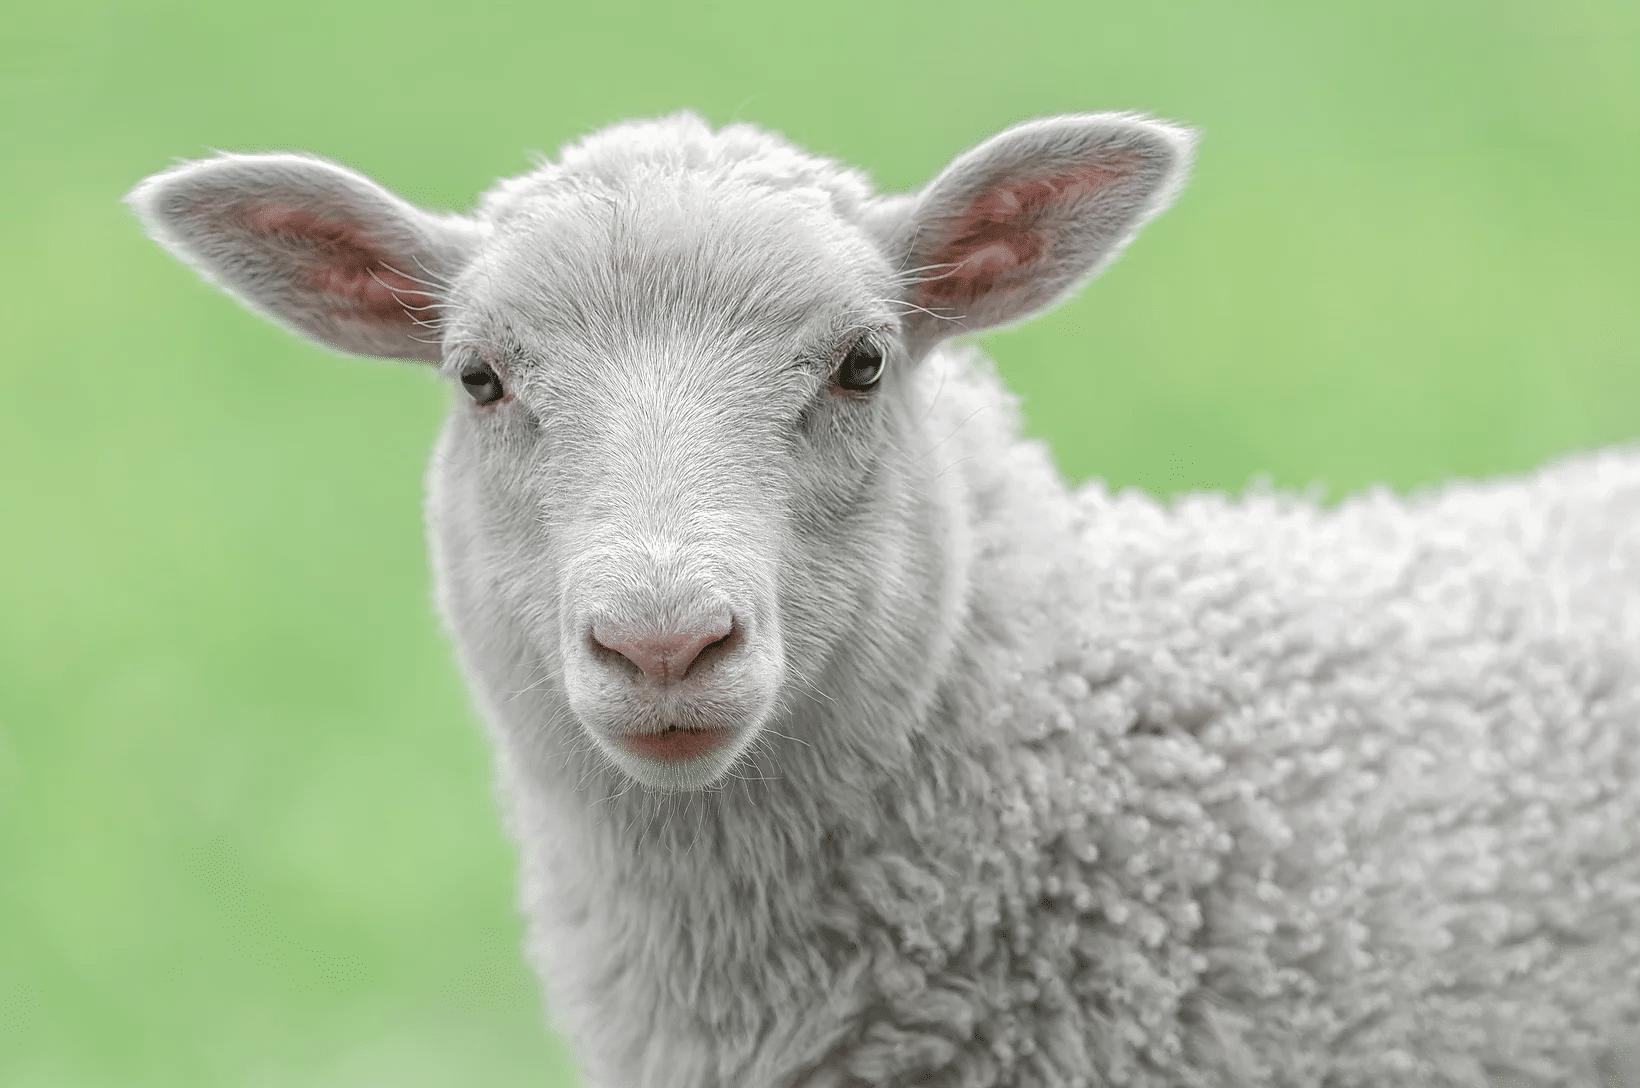 wunderbar humane choice australian lamb paleo foundation